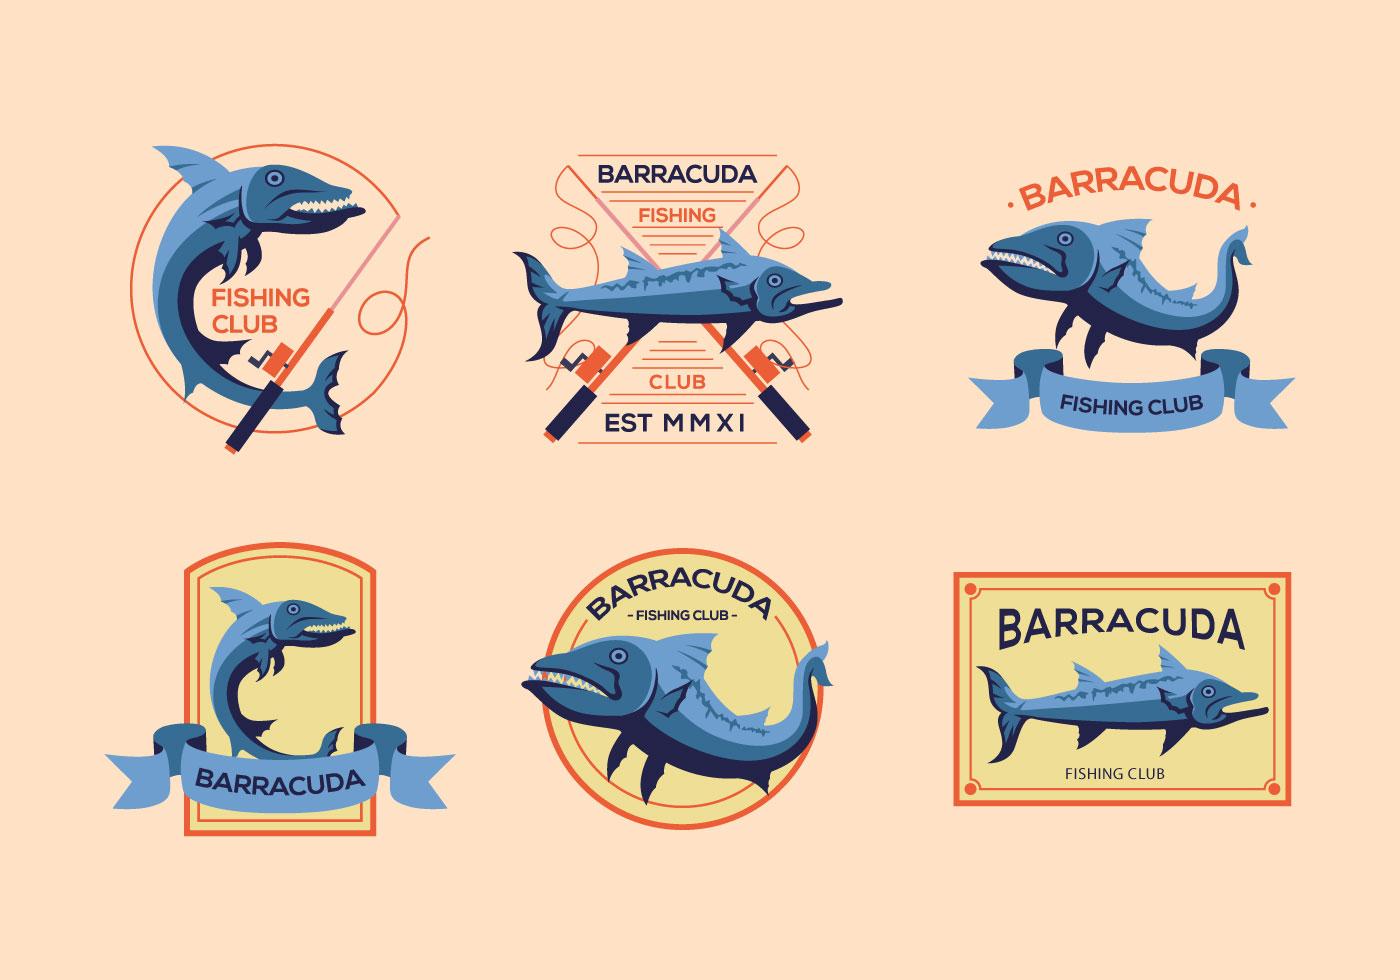 Barracuda fish logo